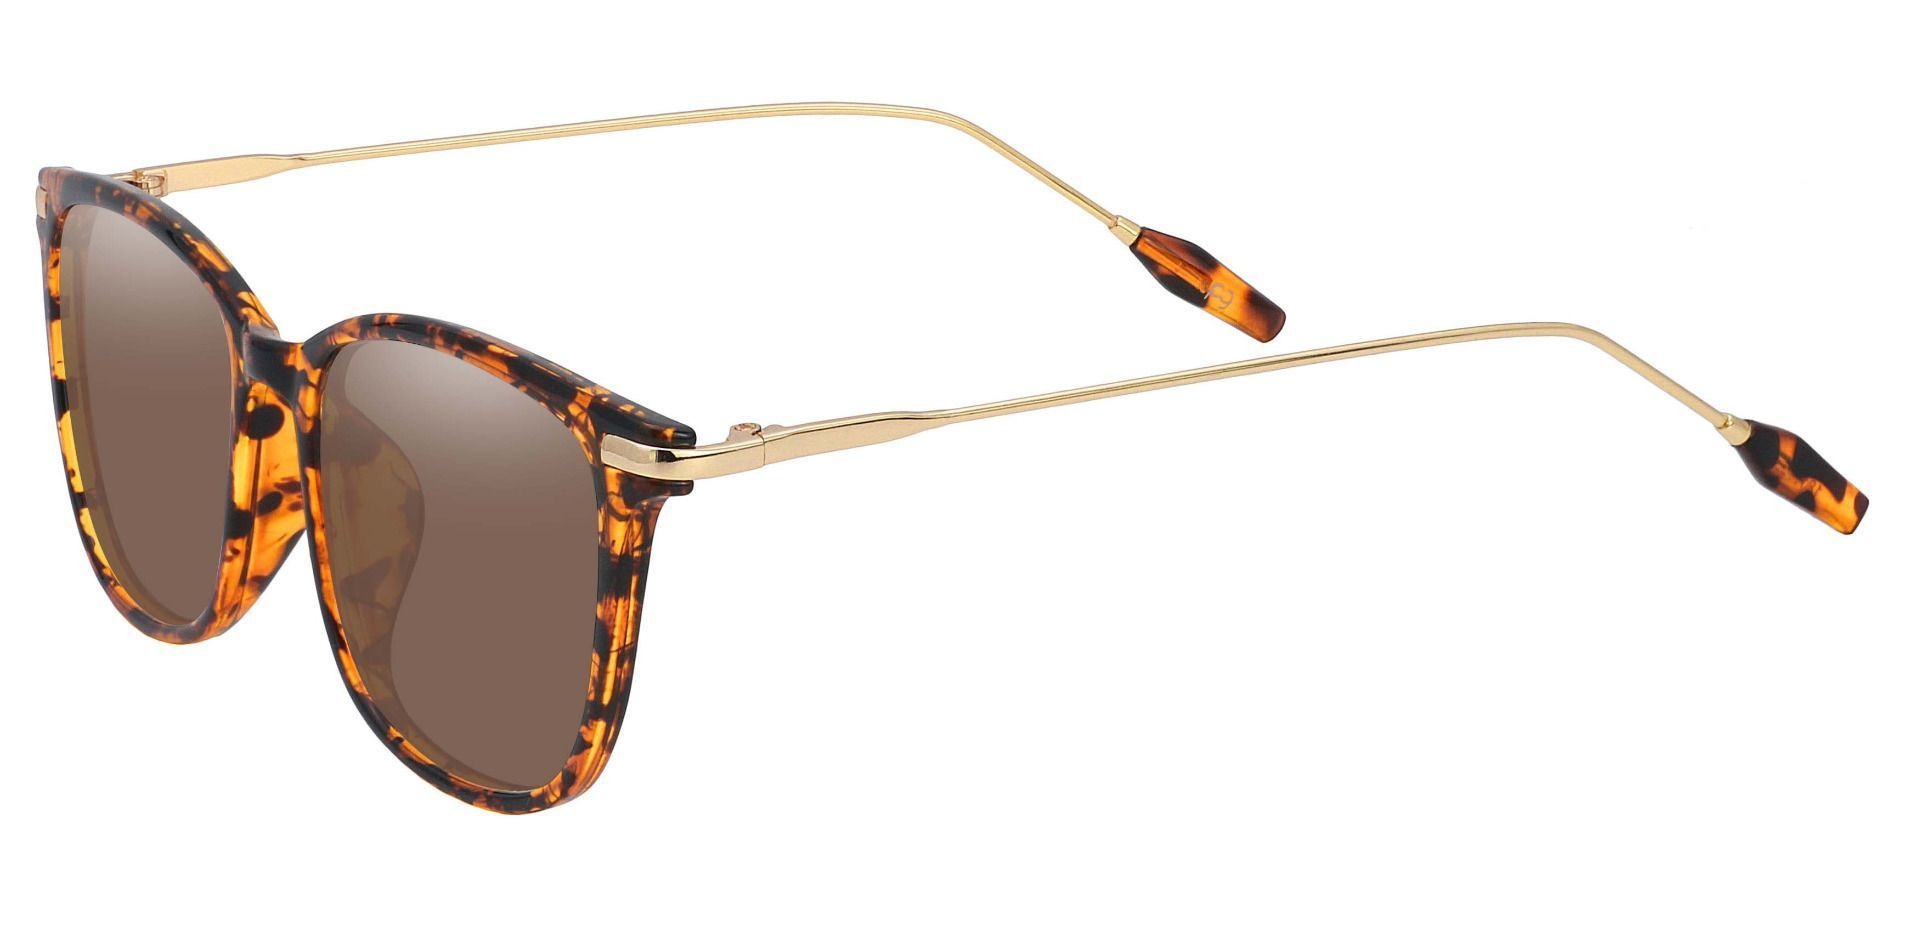 Katie Oval Prescription Sunglasses - Tortoise Frame With Brown Lenses